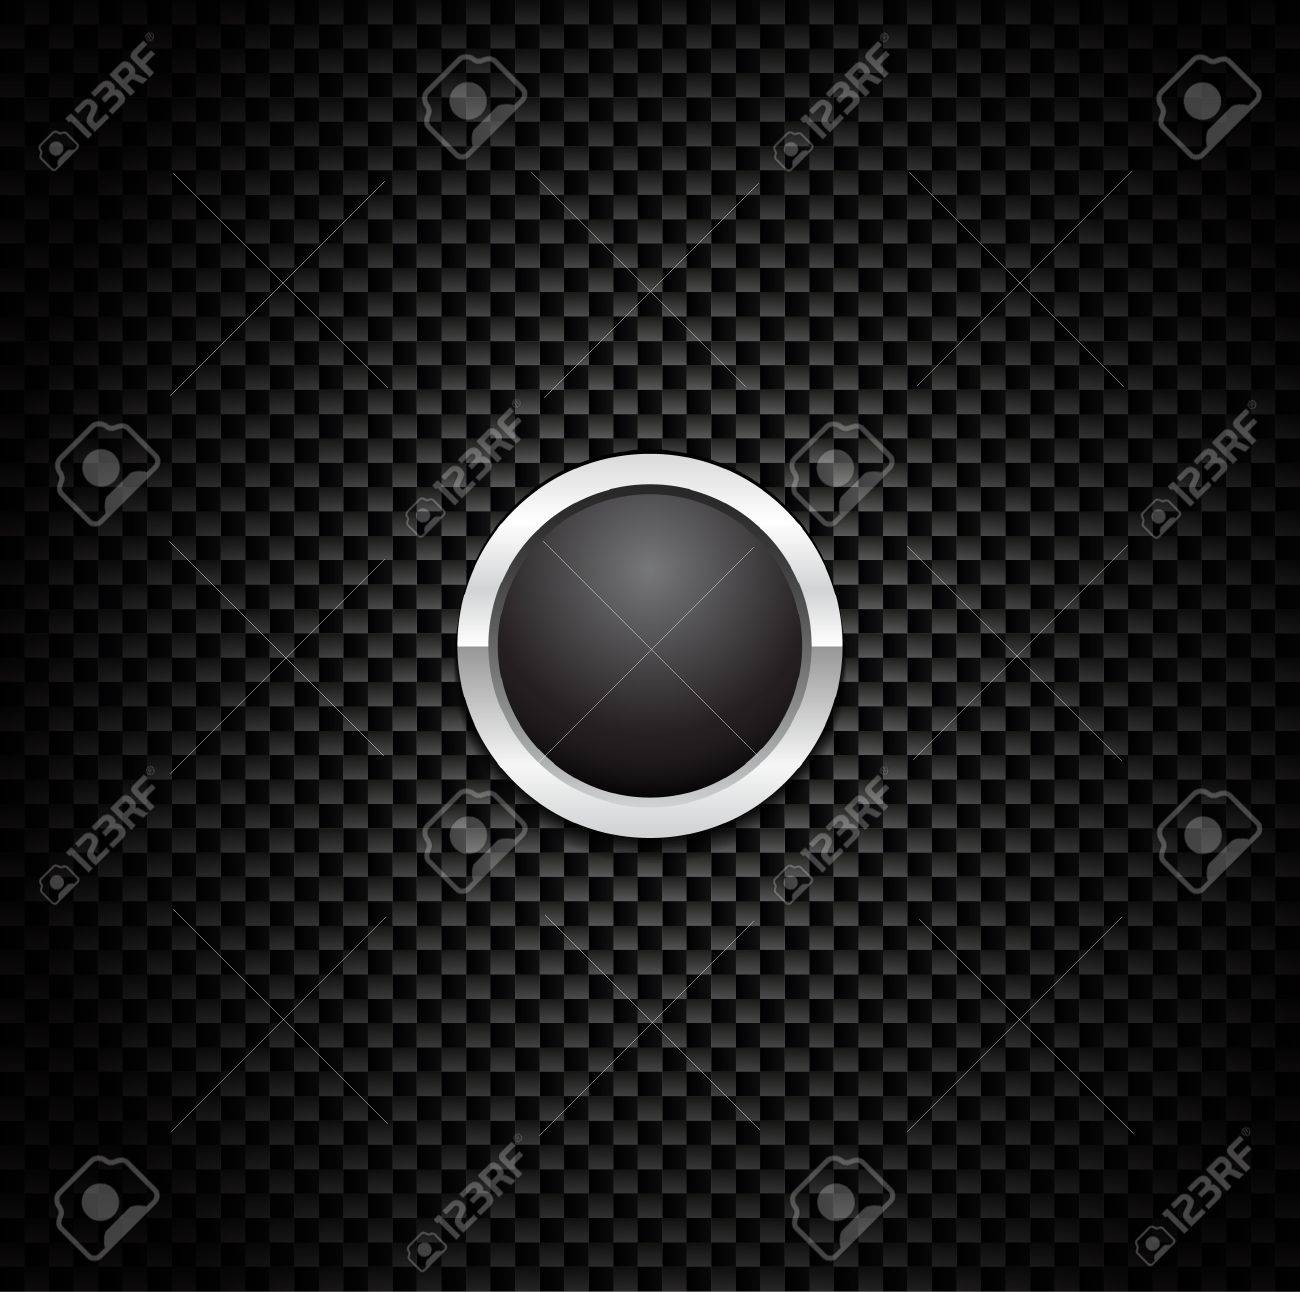 Vector Button on Carbon Fiber Background. Eps10! Stock Vector - 9093400